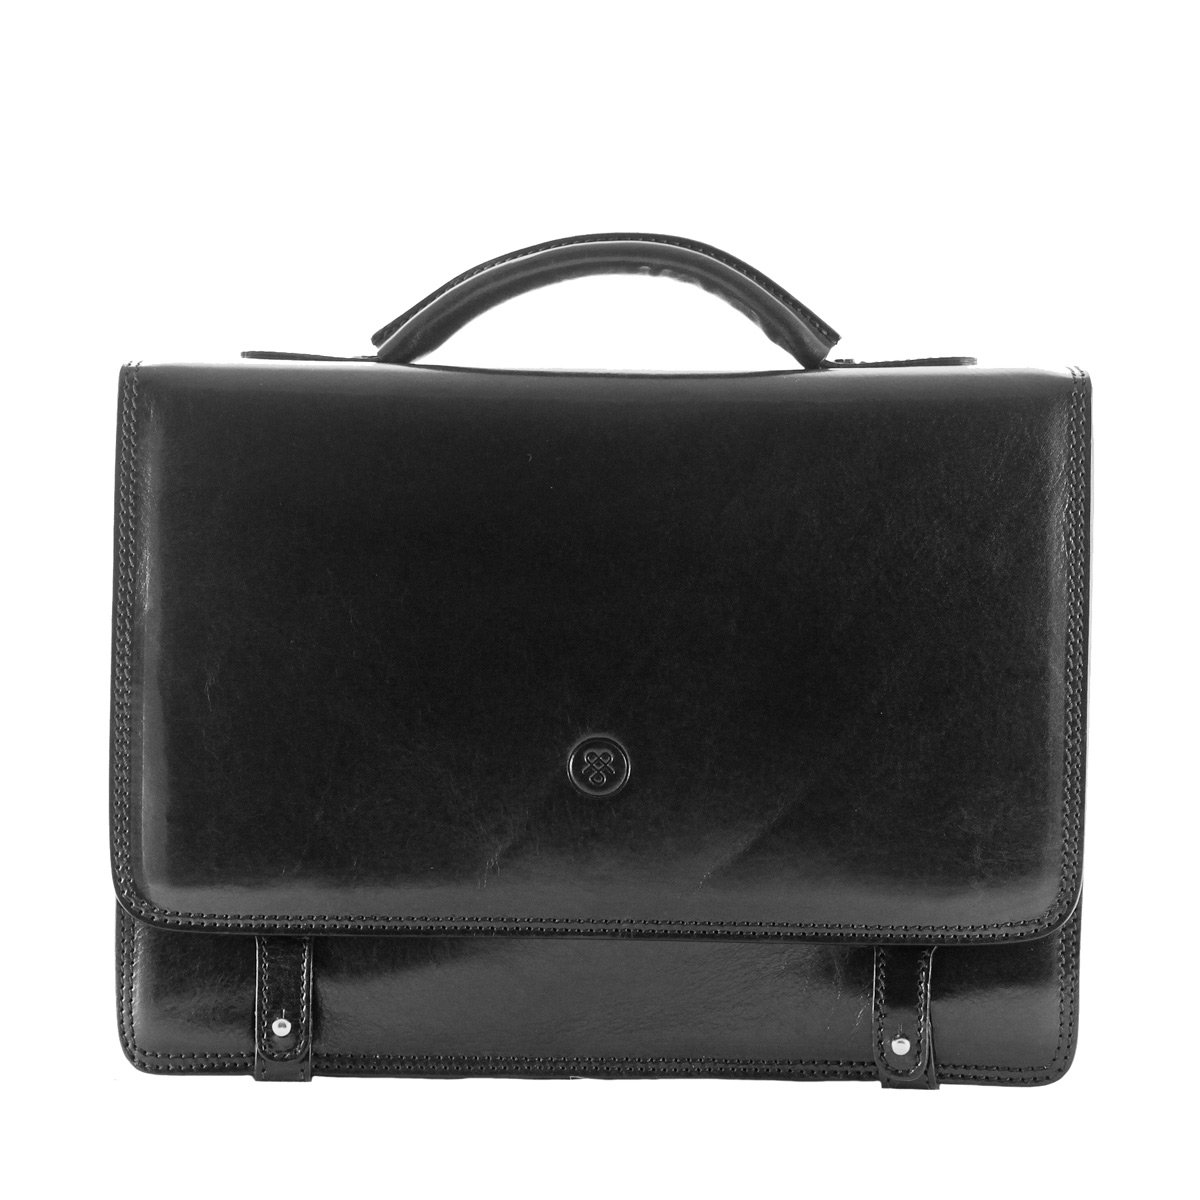 Maxwell Scott Luxury Black Leather Mens Satchel (The Battista) - One Size